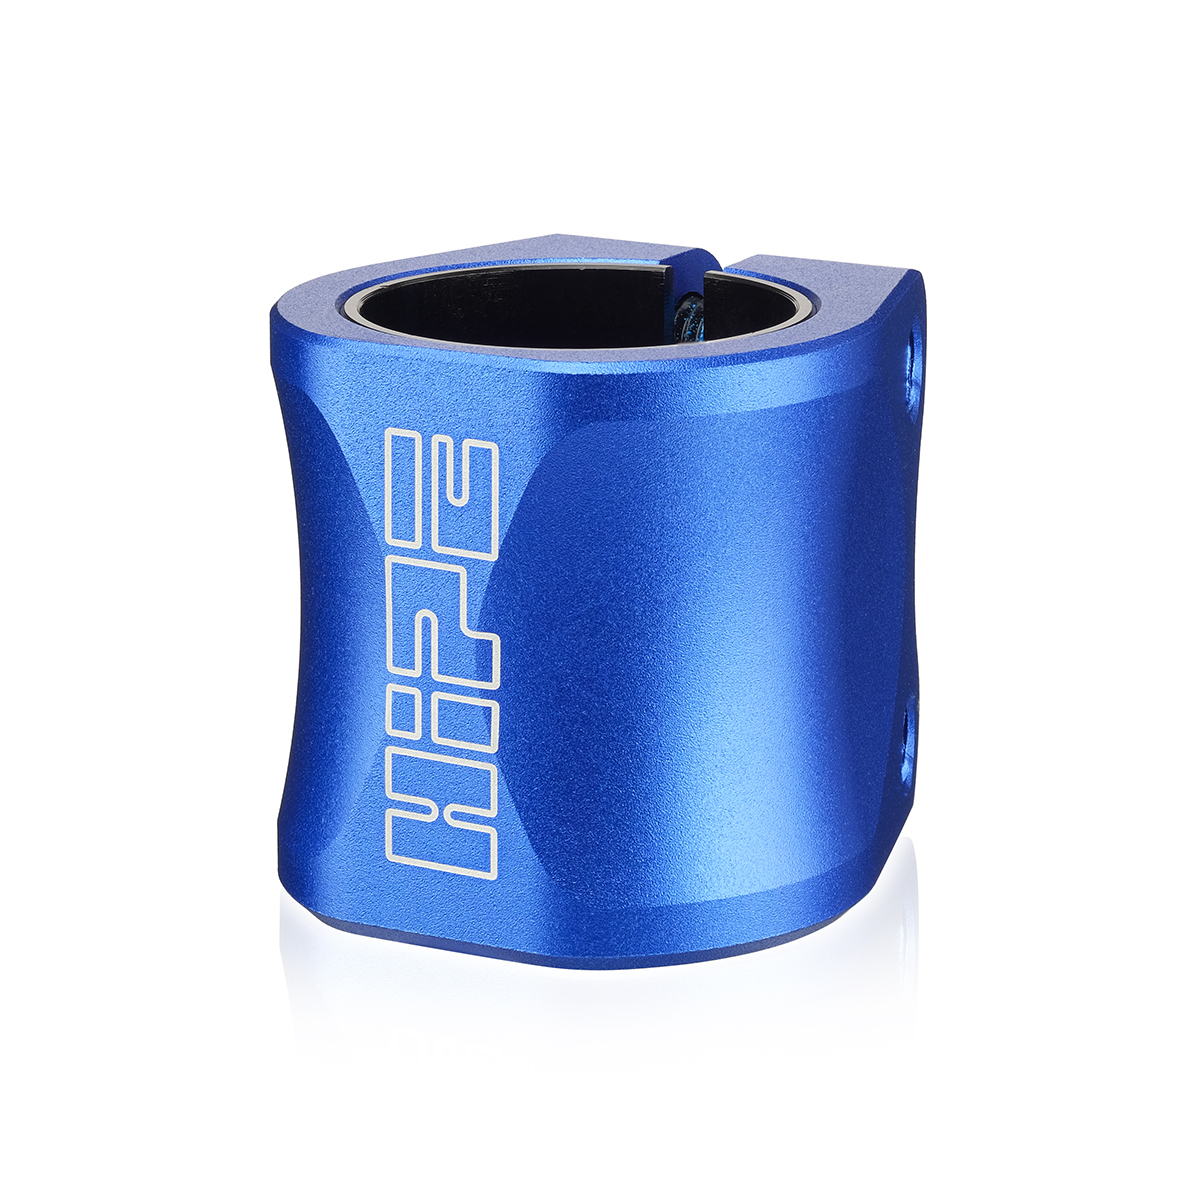 Хомут HIPE H-71 IHC/HIC blue matt